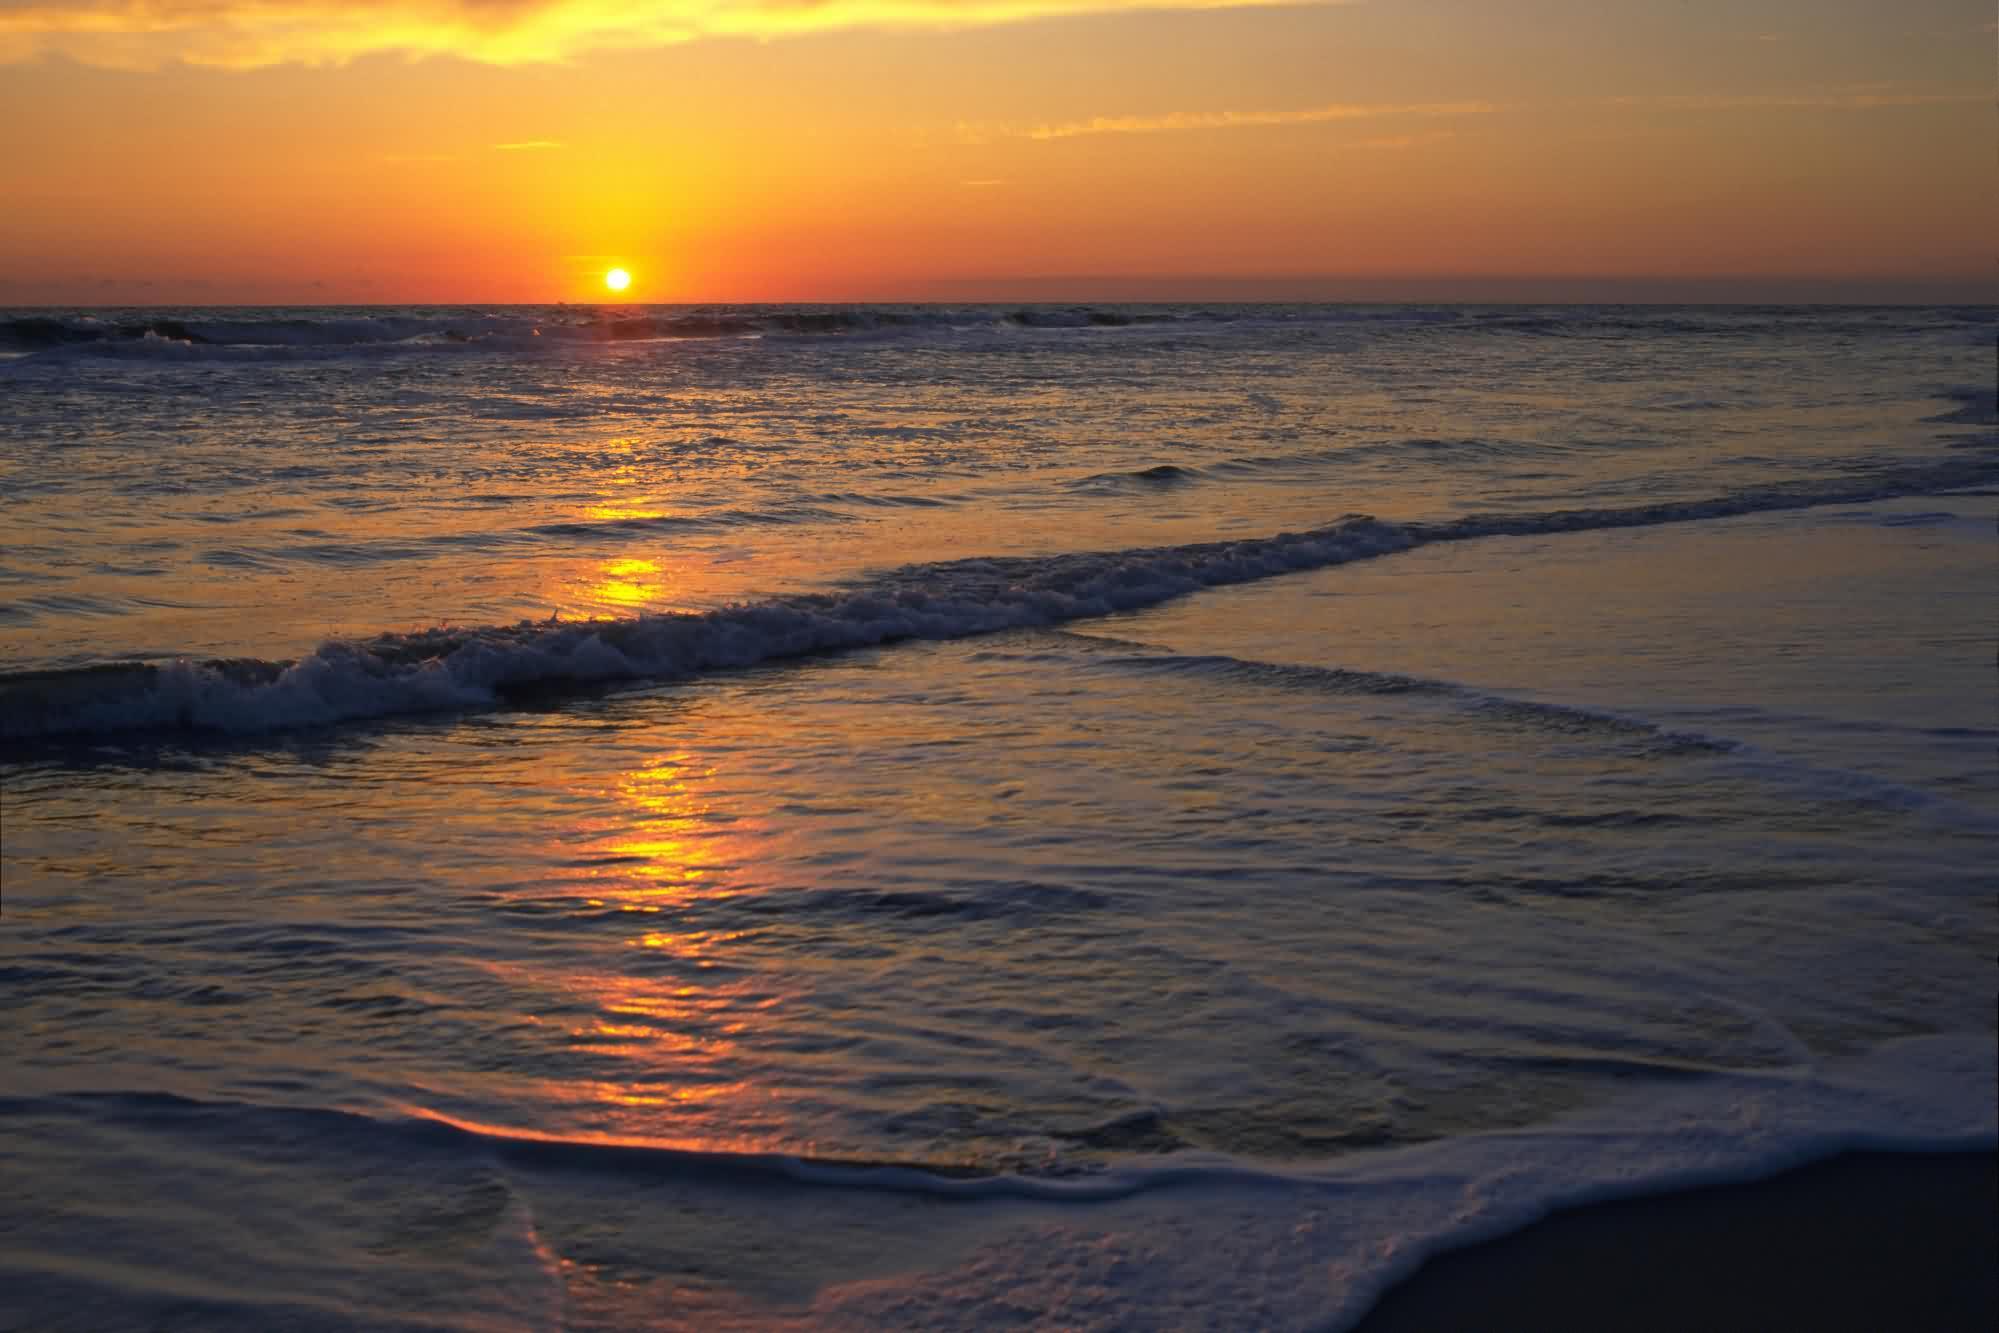 Good morning Apopka...enjoy the sunrise on the seashore - The Apopka ...